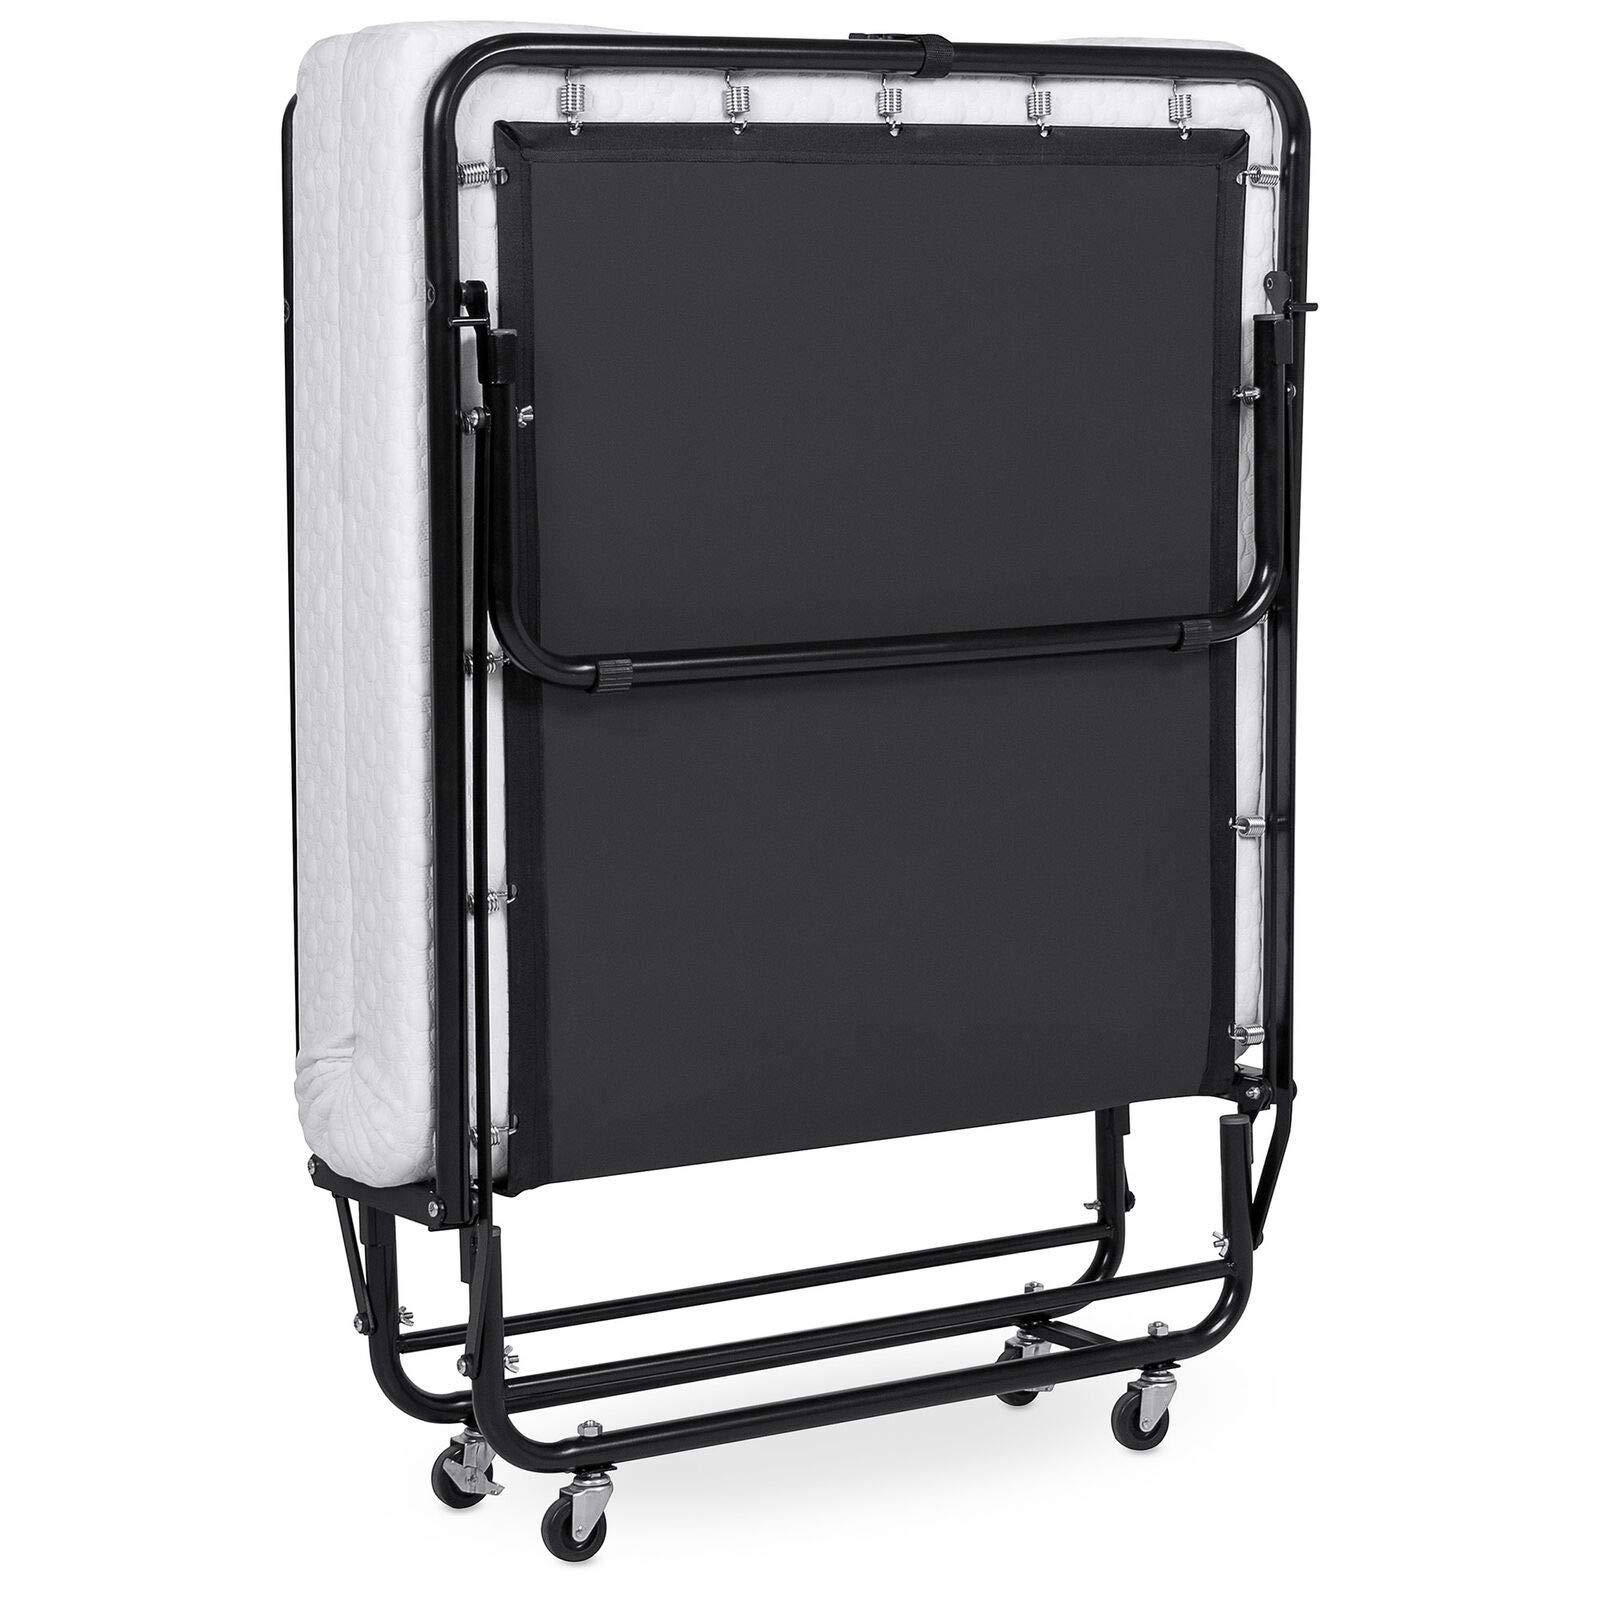 Folding Extra Bed Twin Size Rollaway Metal Bed Memory Foam Mattress Foldaway for Guest